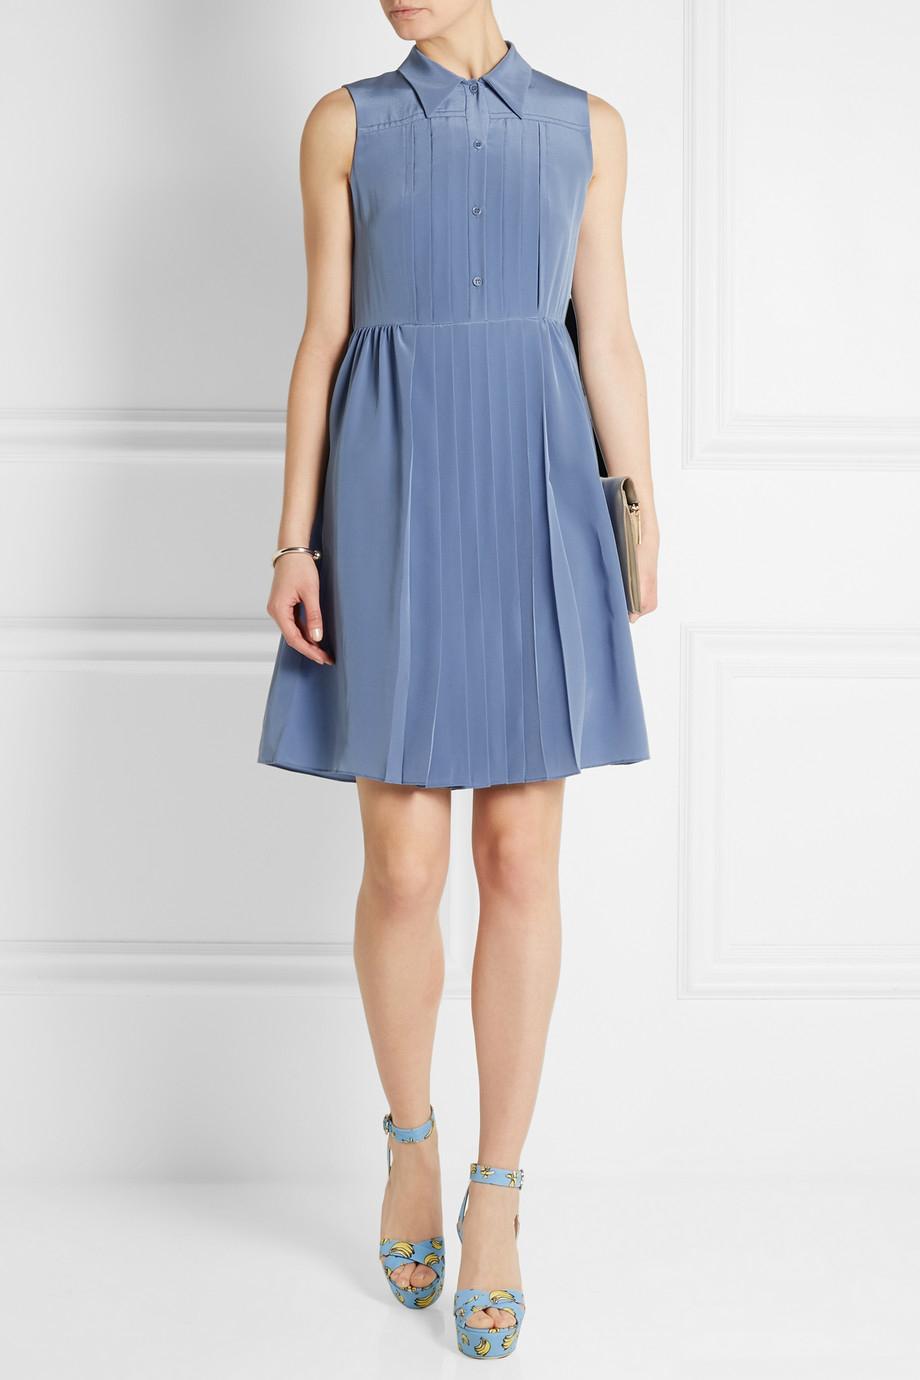 lyst miu miu pleated silk crepe de chine dress in blue. Black Bedroom Furniture Sets. Home Design Ideas